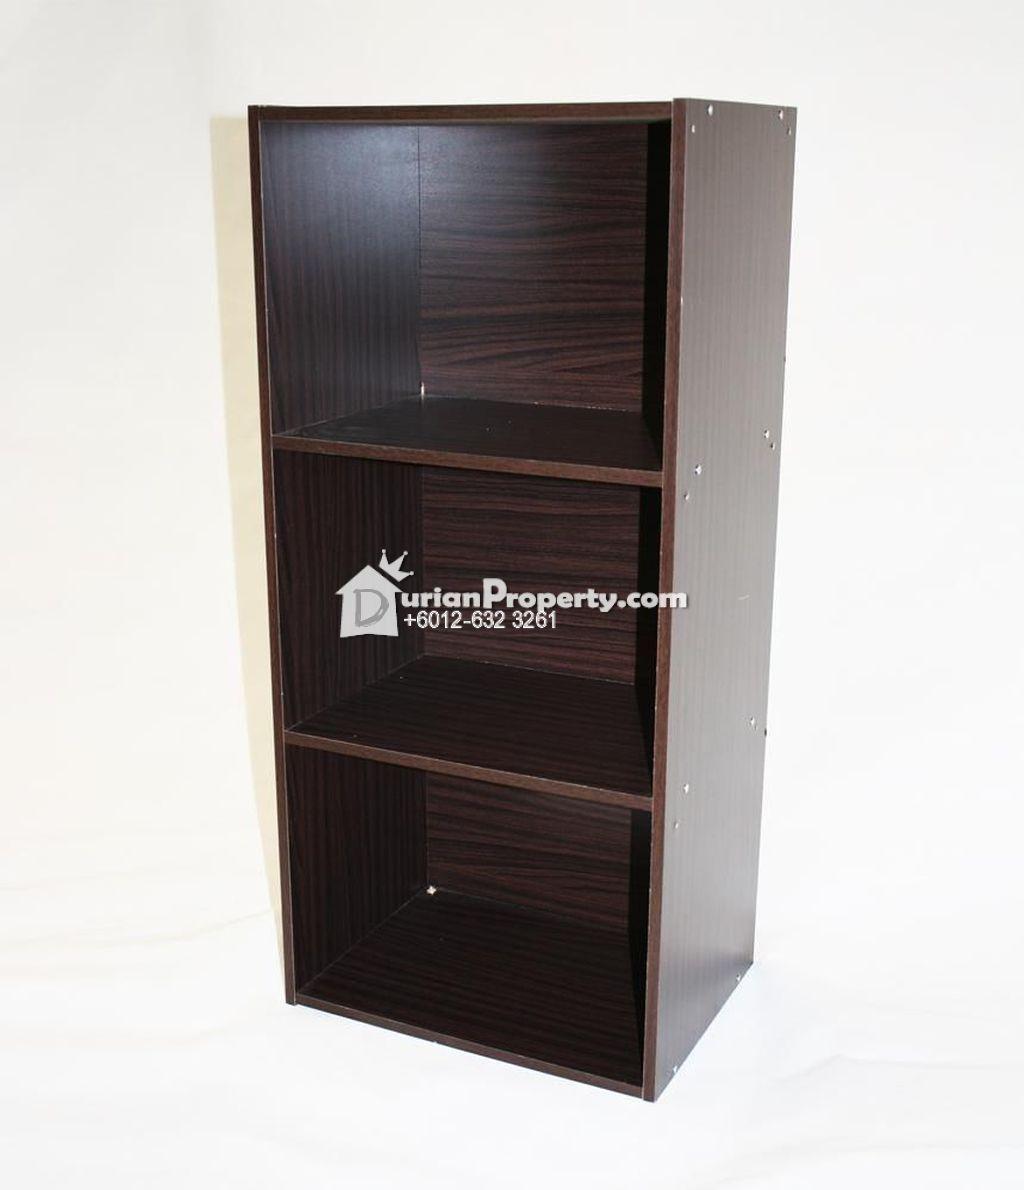 3 Tier Shelf Unit Beech Effect / Shelf Book For Sale